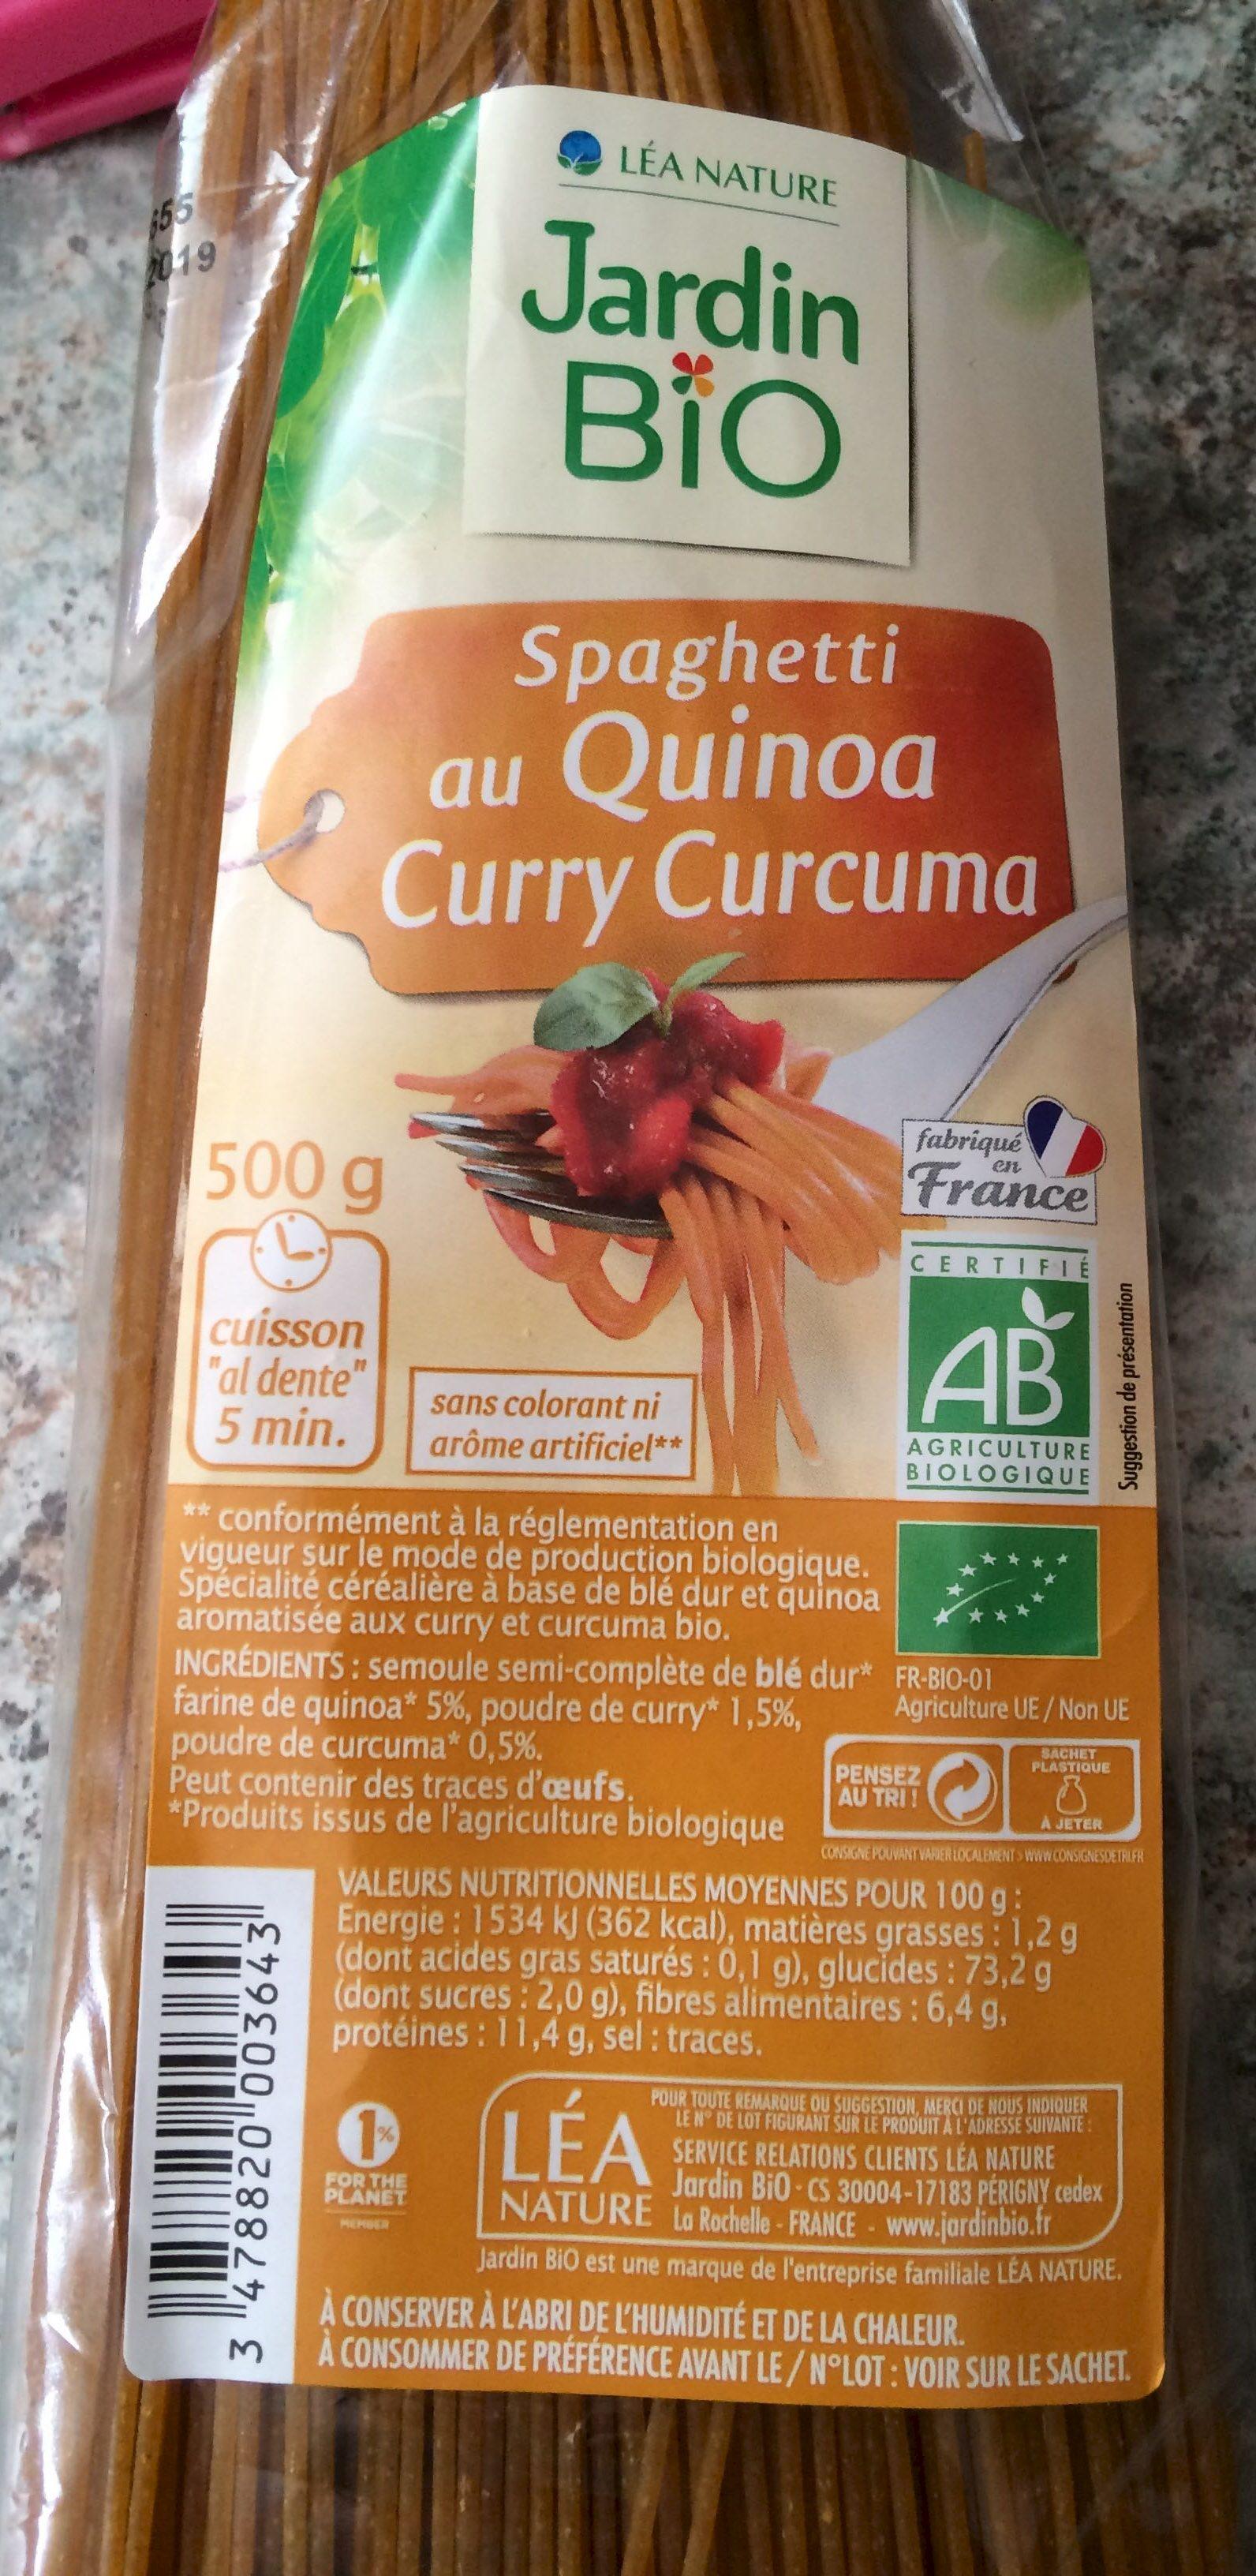 Spaghetti au quinoa curry curcuma Jardin Bio 500 g